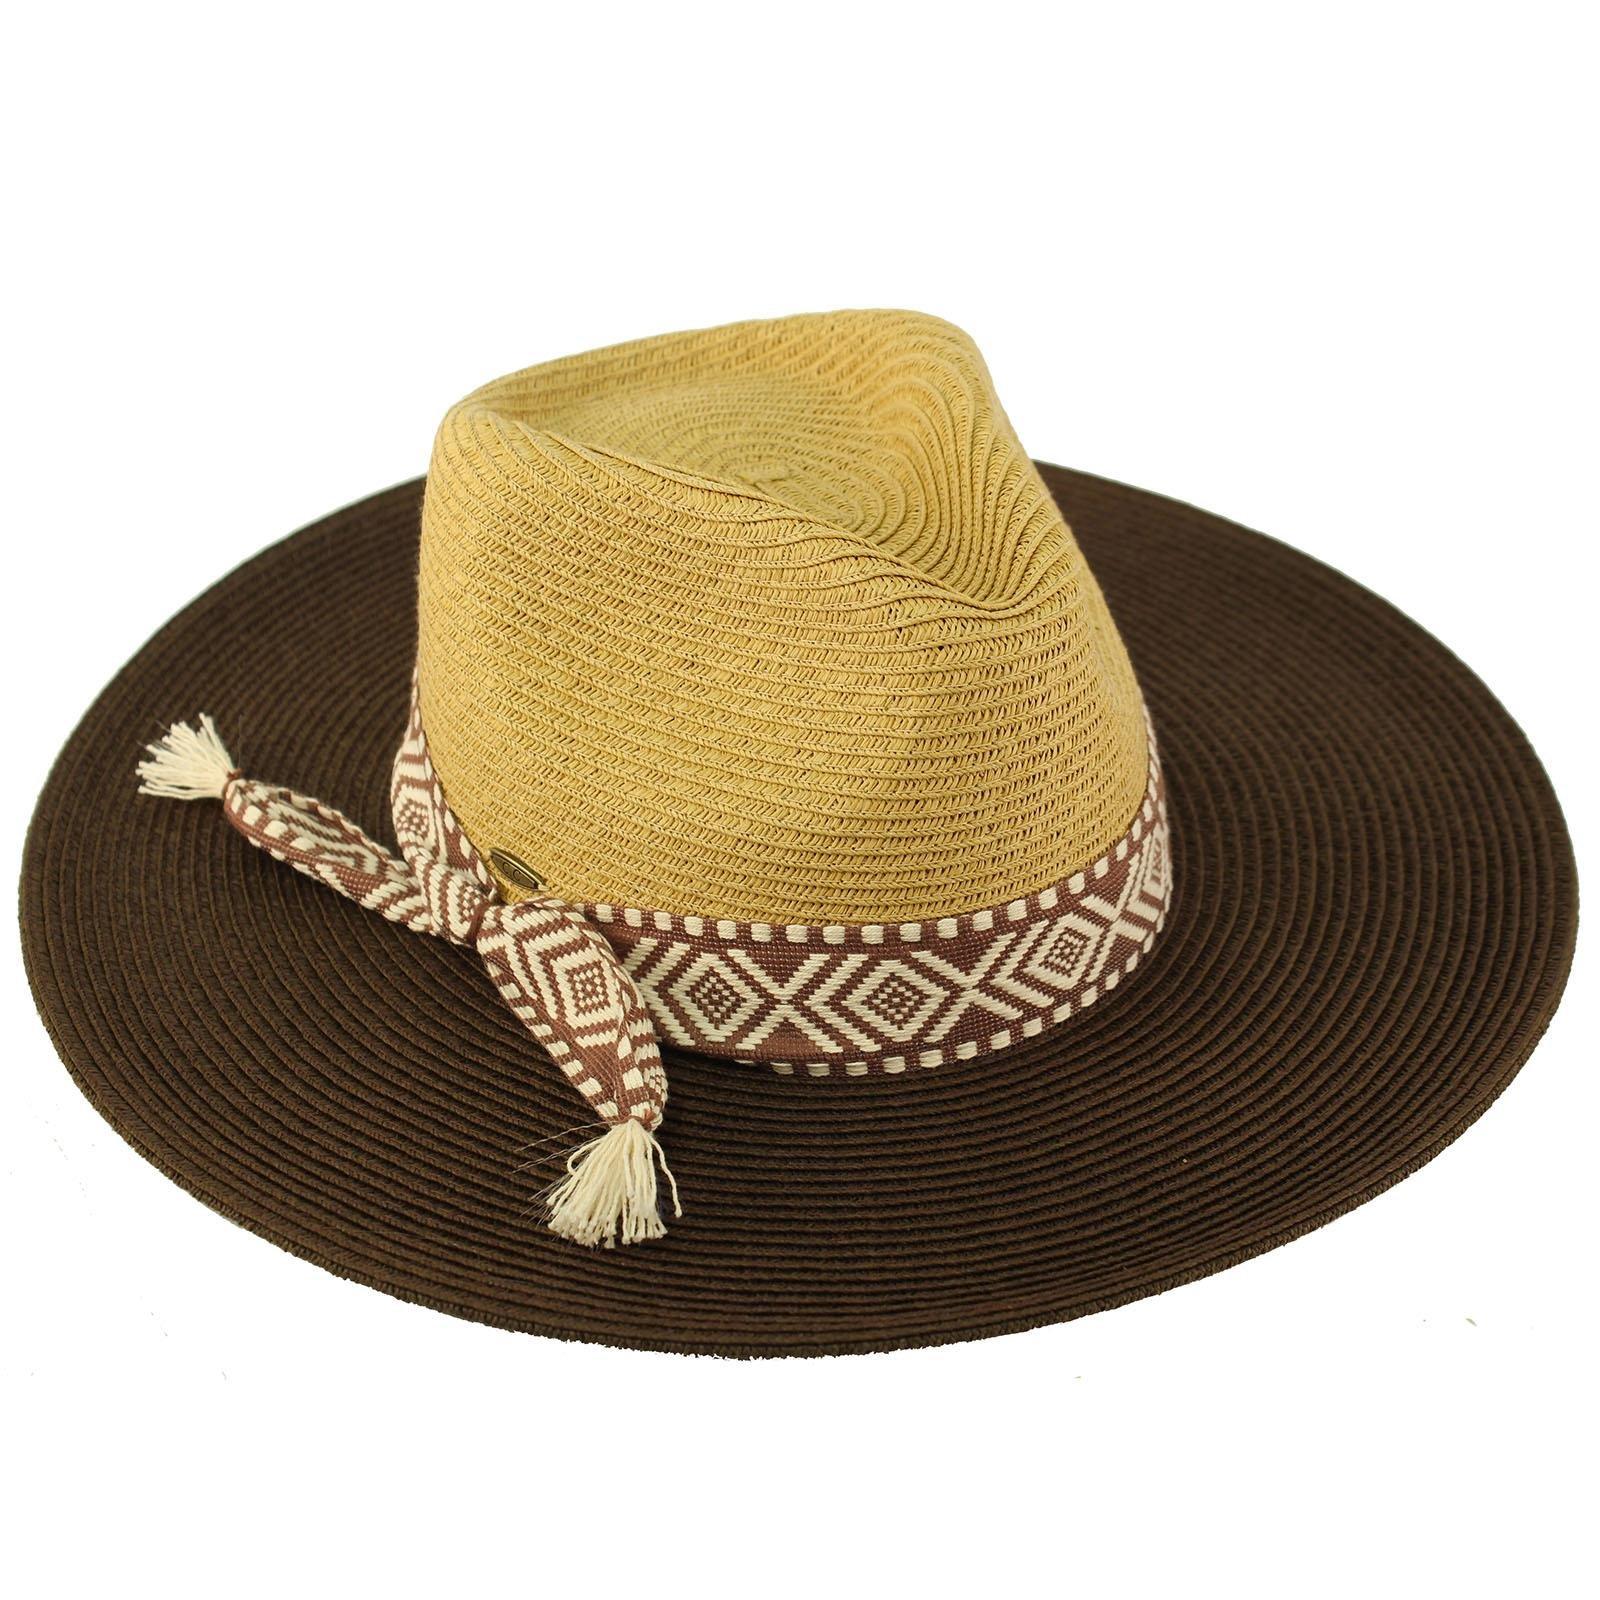 C.C Aztec Tassel Panama 2tone Fedora Wide Brim Summer Beach Pool Sun Hat Brown